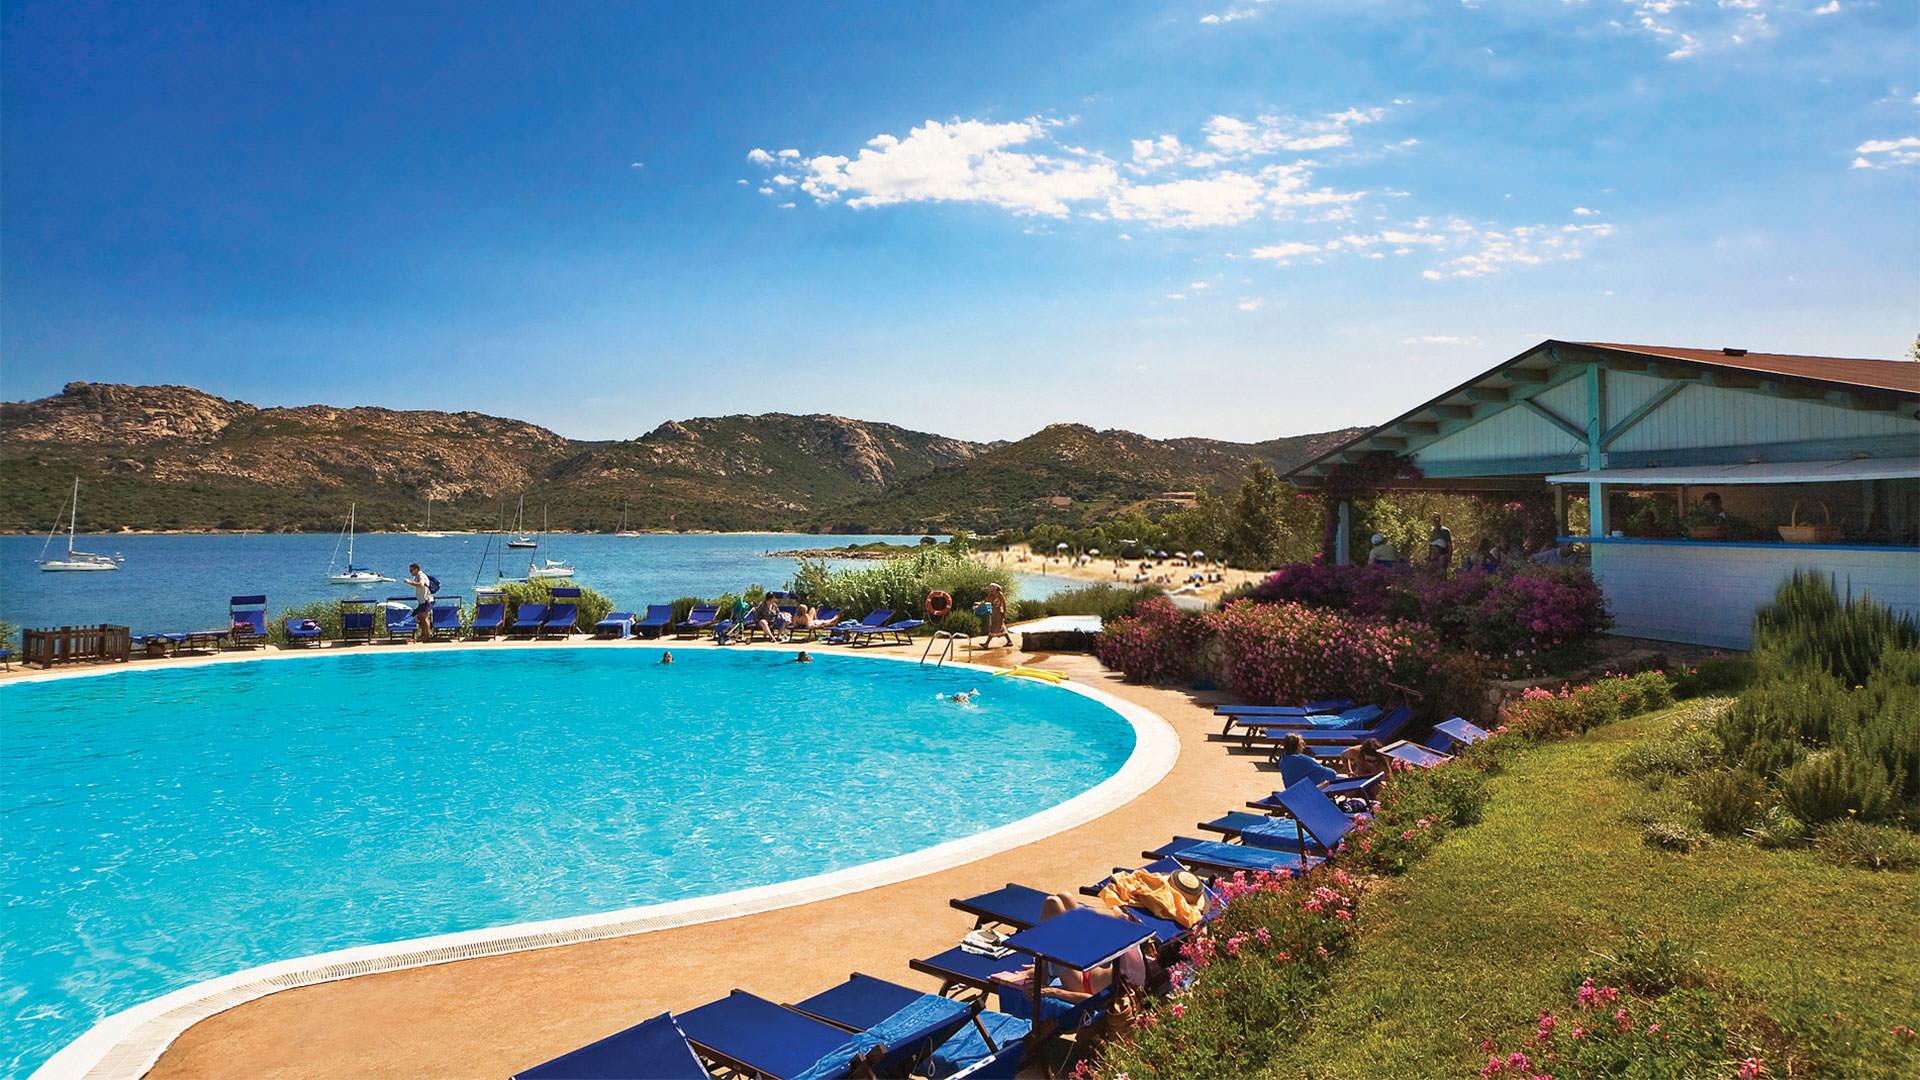 hotel-cala-lepre-slider-mare-spiaggia-piscina-bimbi-palau-mini1